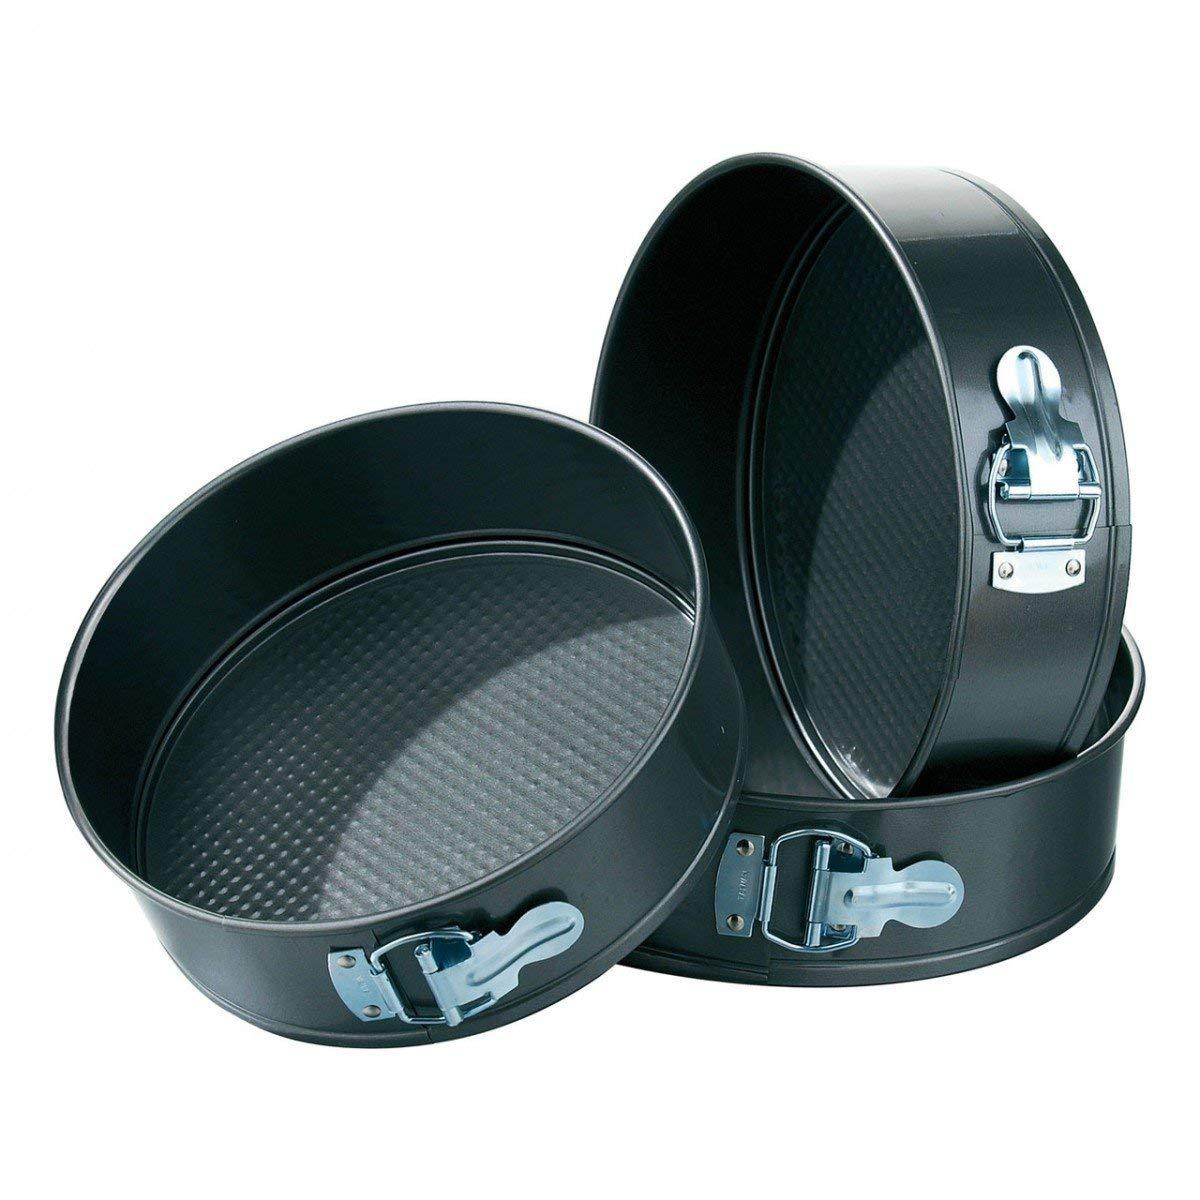 JOLLY Teflon Coated Springform Cake Mould Pan Set, 3-Pieces, Black